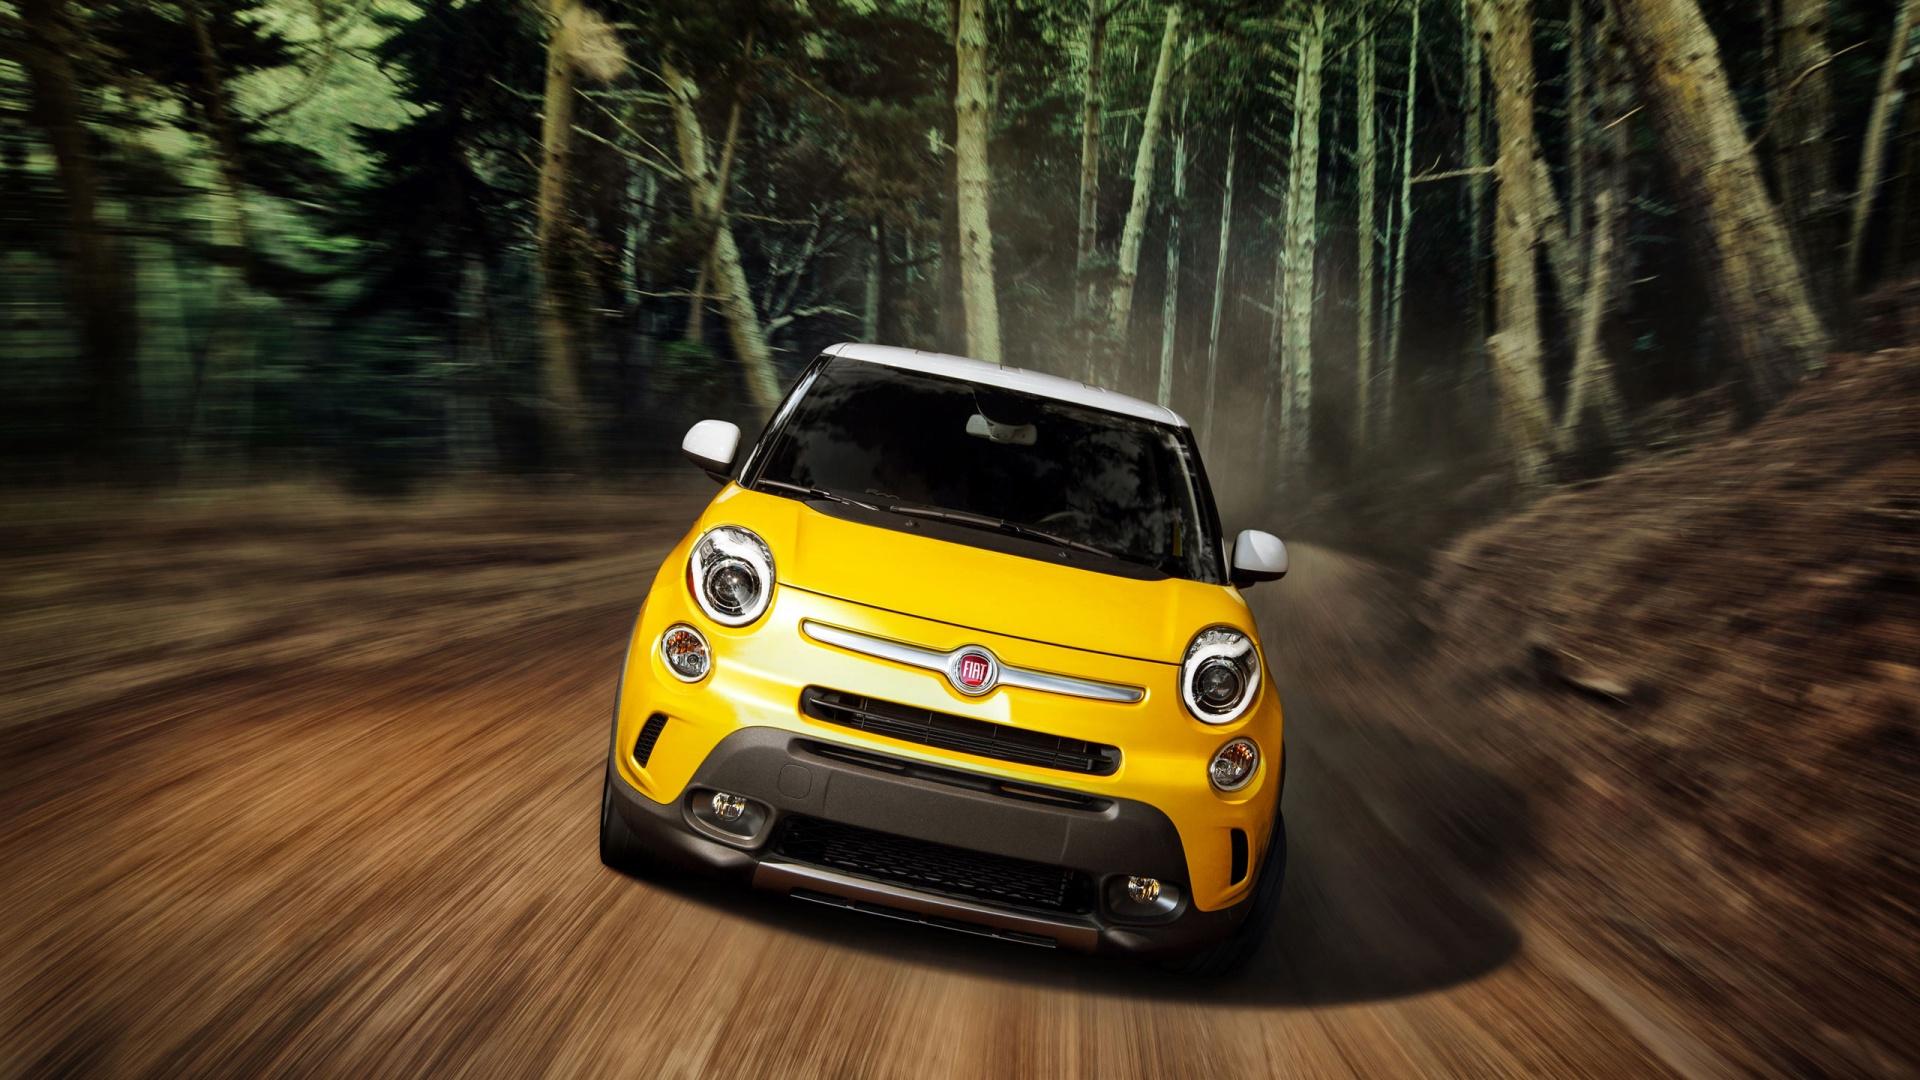 20 Excellent Fiat Car Wallpapers